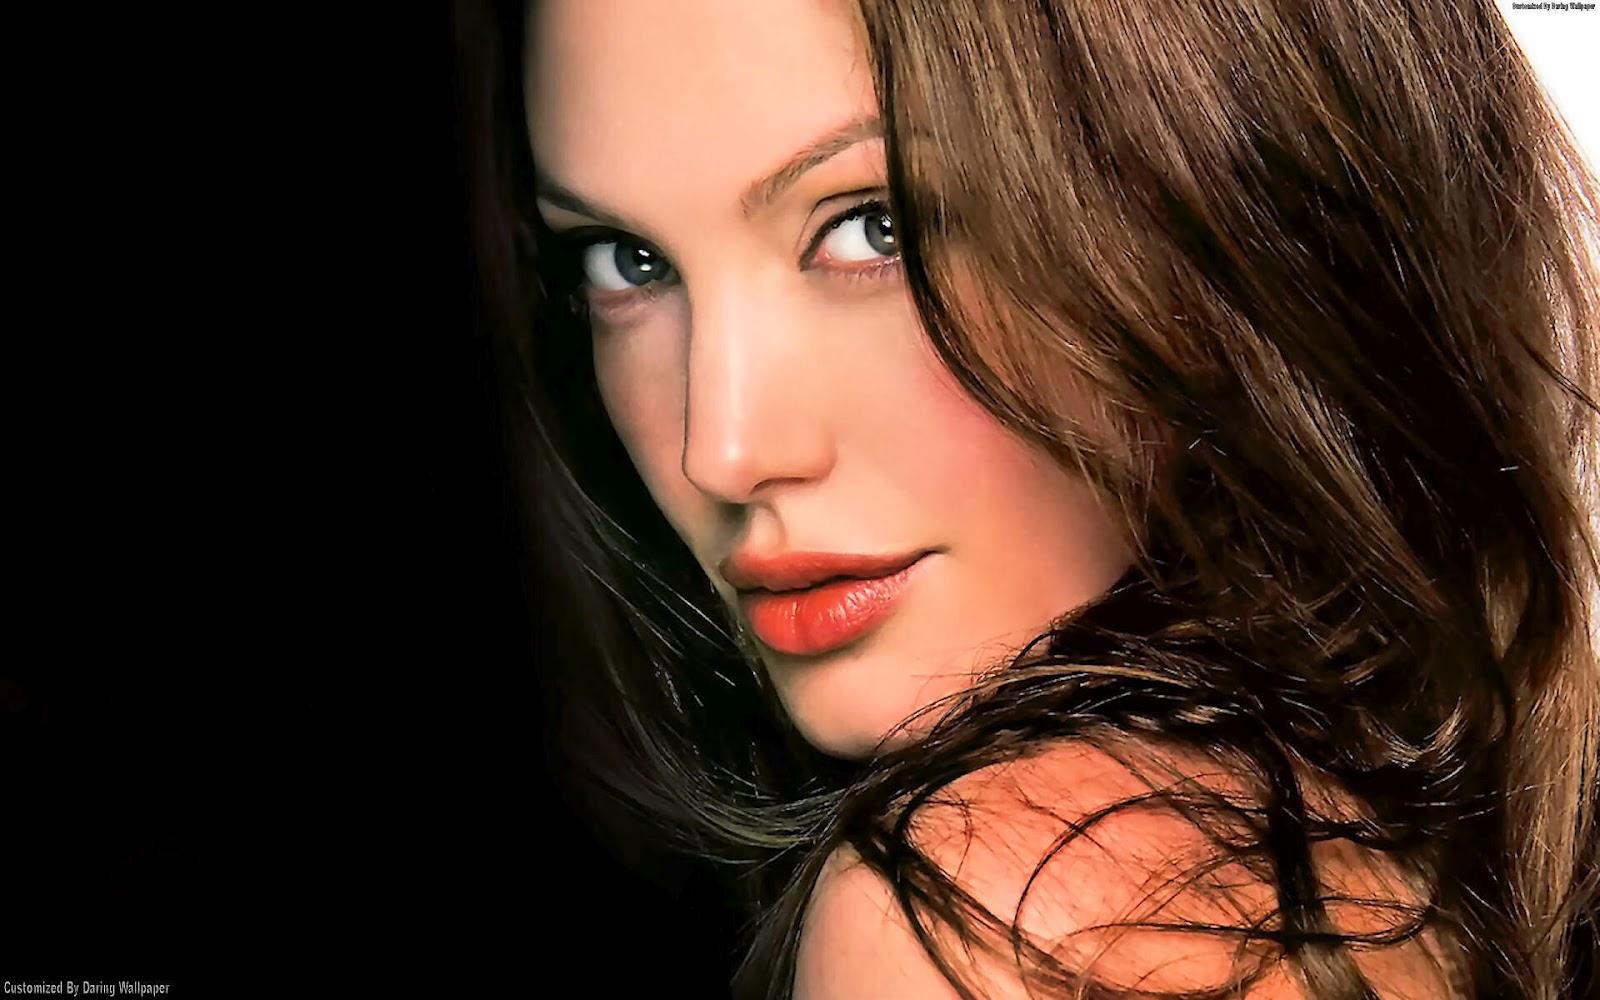 http://3.bp.blogspot.com/-vax-c_o0SNk/T5aOG7W9pYI/AAAAAAAAJCE/j6VFFsE0iB4/s1600/Angelina-Jolie-Wallpaper-angelina-jolie-19939129-1920-1200.jpg